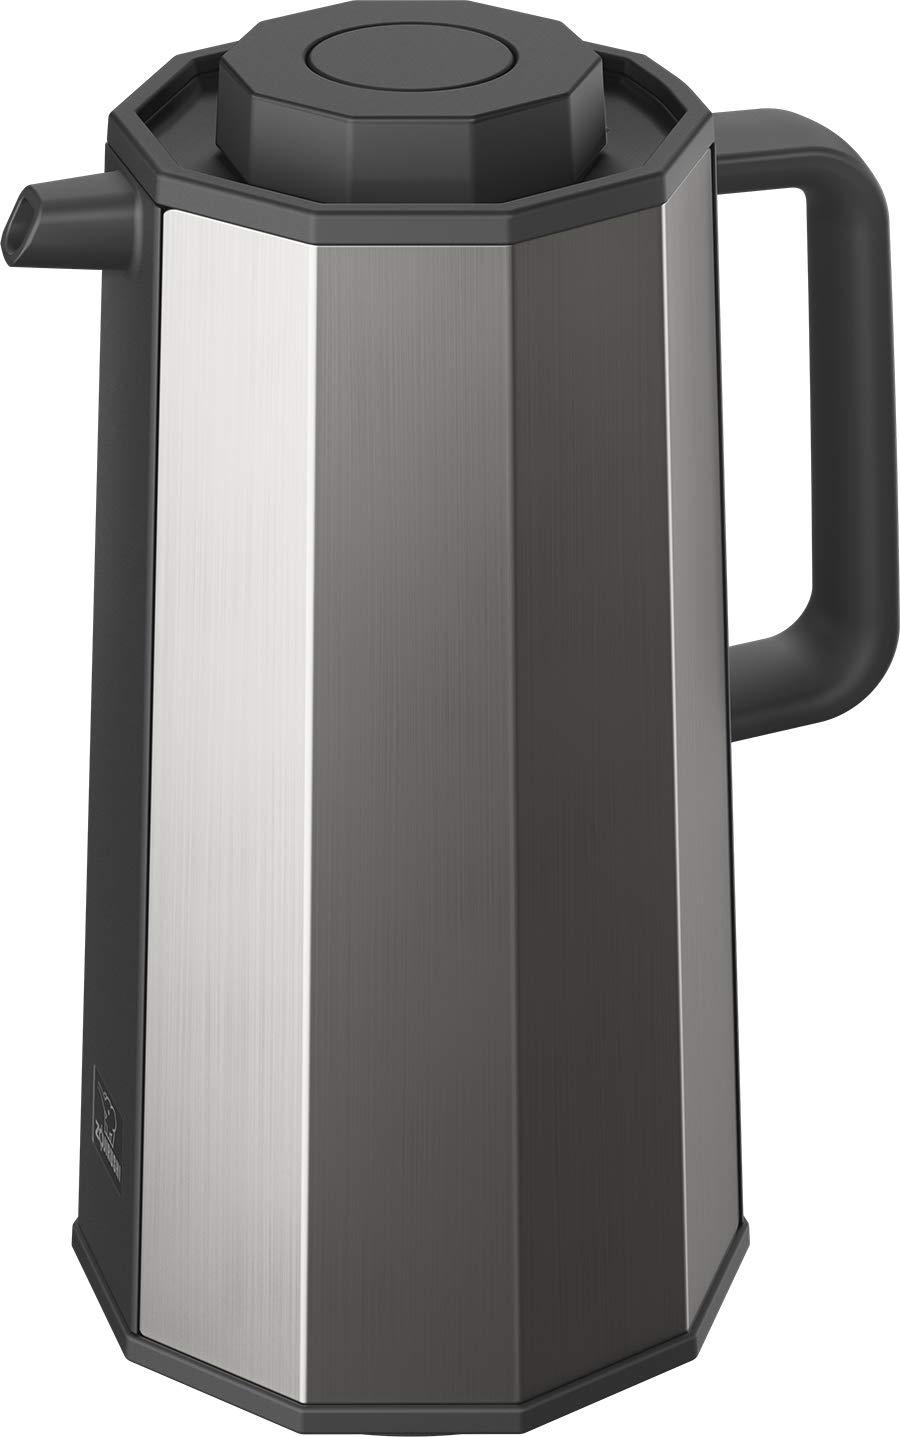 Zojirushi AH-EAE10SA Glass Vacuum Carafe, 1.0 Liter, Silver by Zojirushi